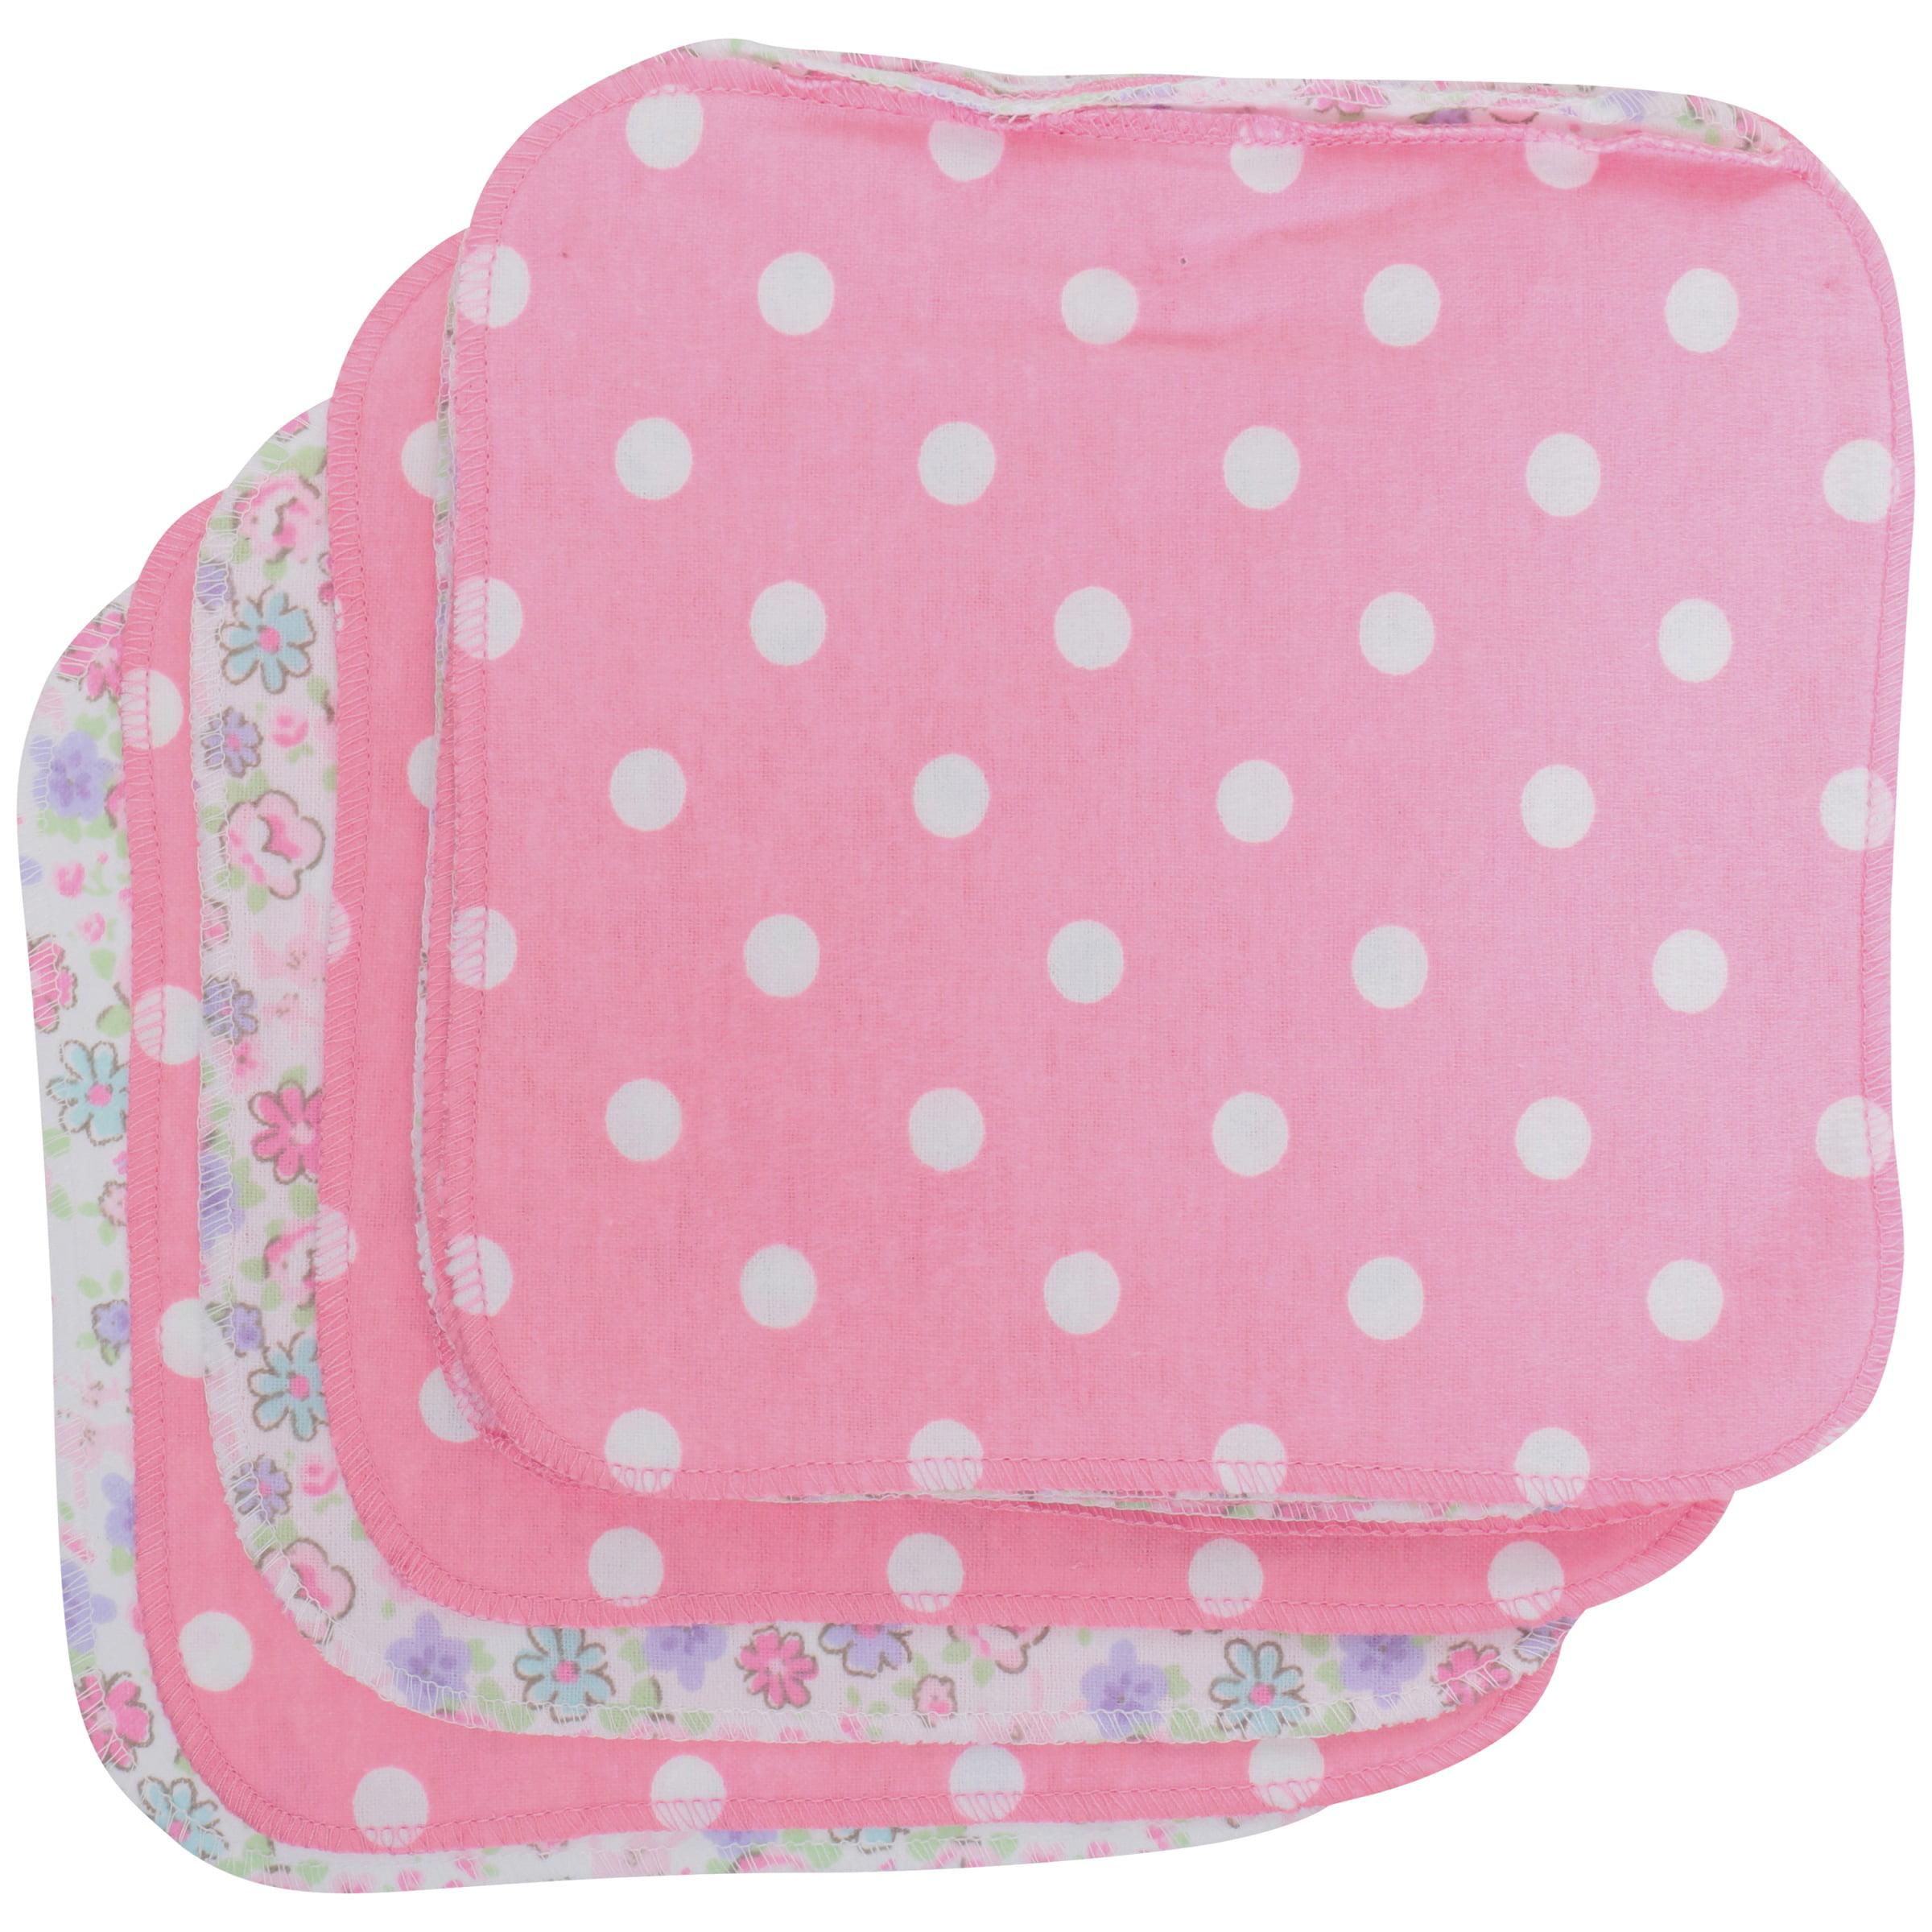 12-Pack Gerber Newborn Baby Boy Reusable Flannel Wipes